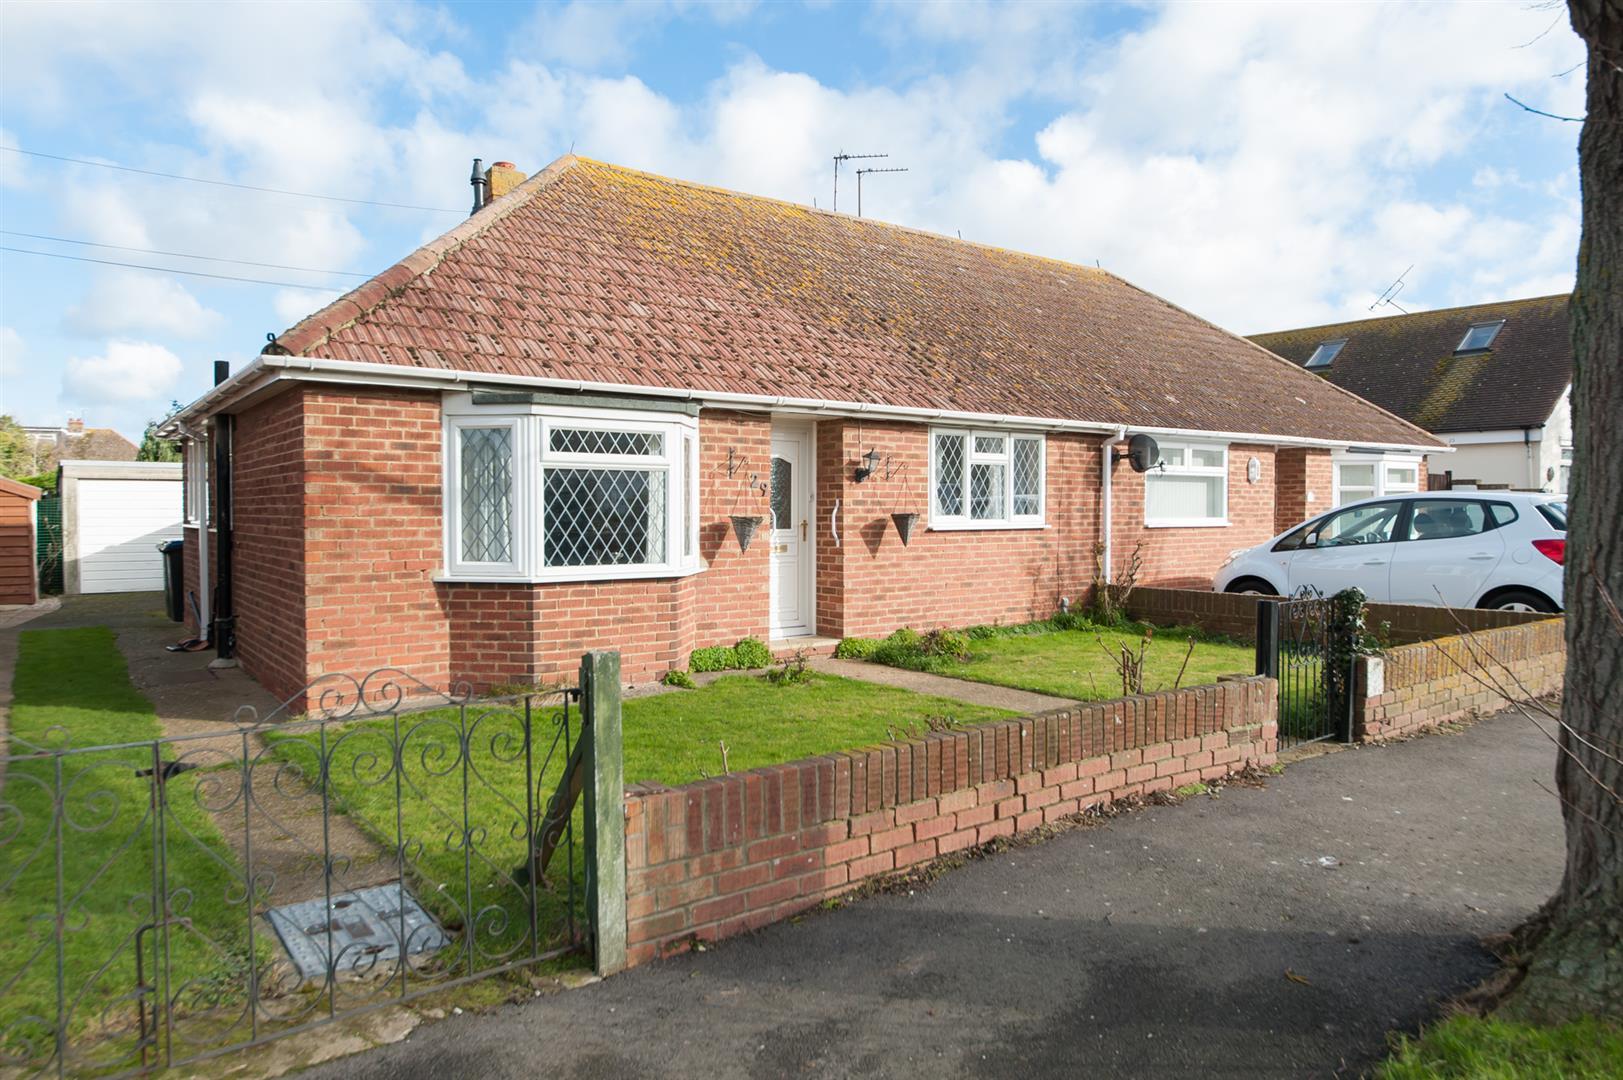 2 Bedrooms Semi Detached Bungalow for sale in Quex View Road, Birchington